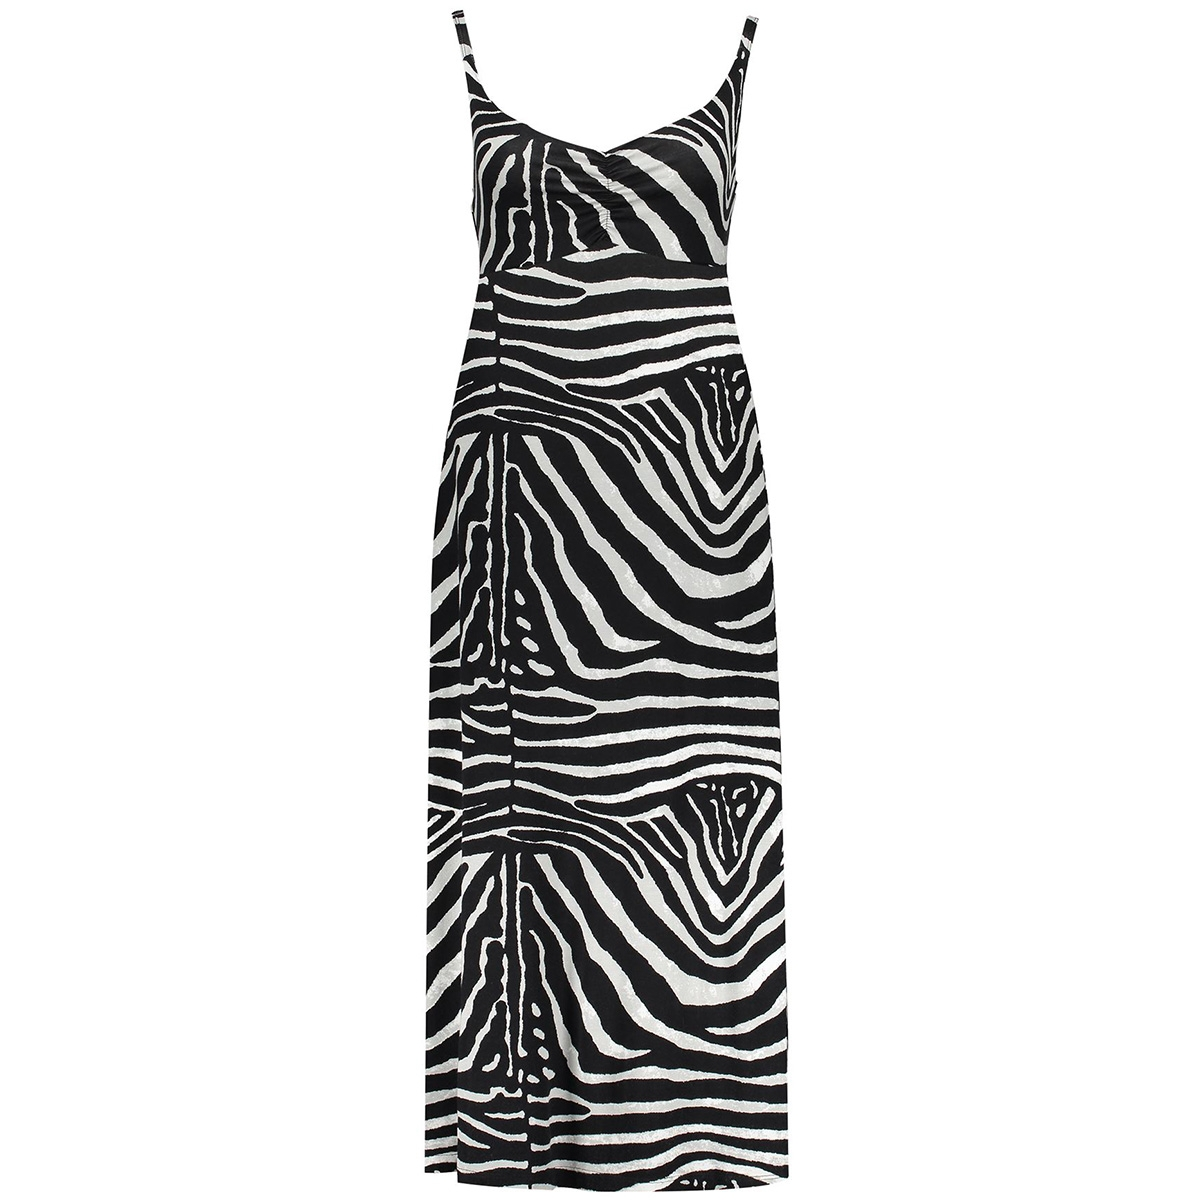 dress aop noelle 07361 60 geisha jurk black/grey zebra